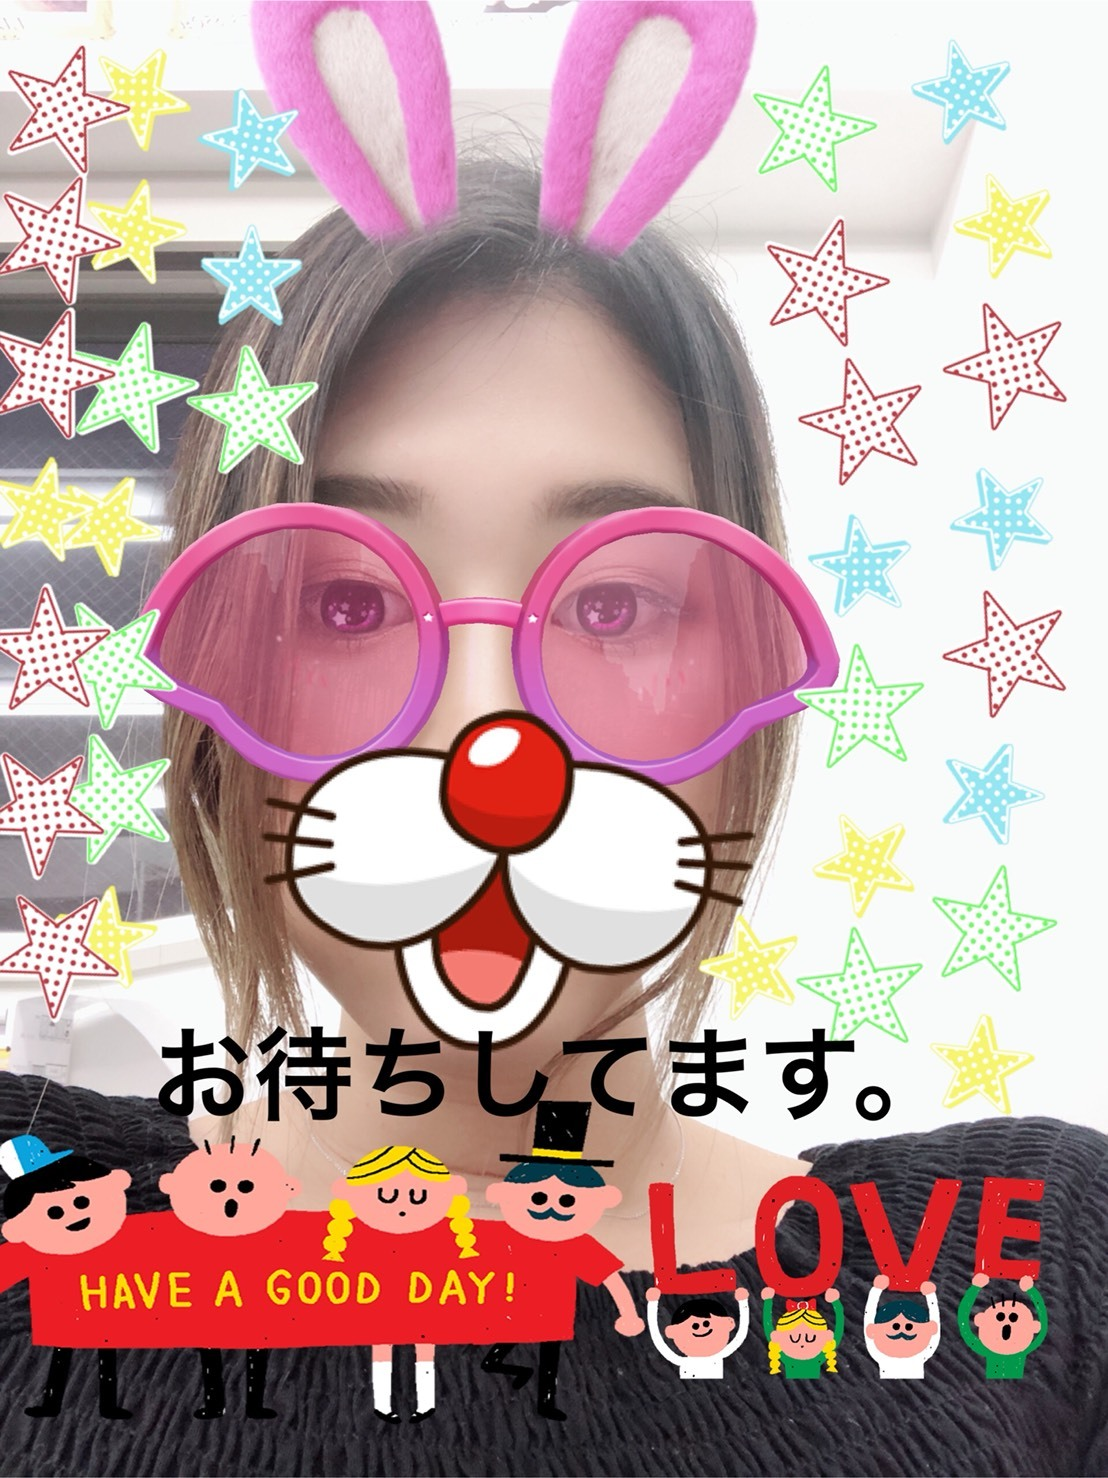 S__34897922.jpg